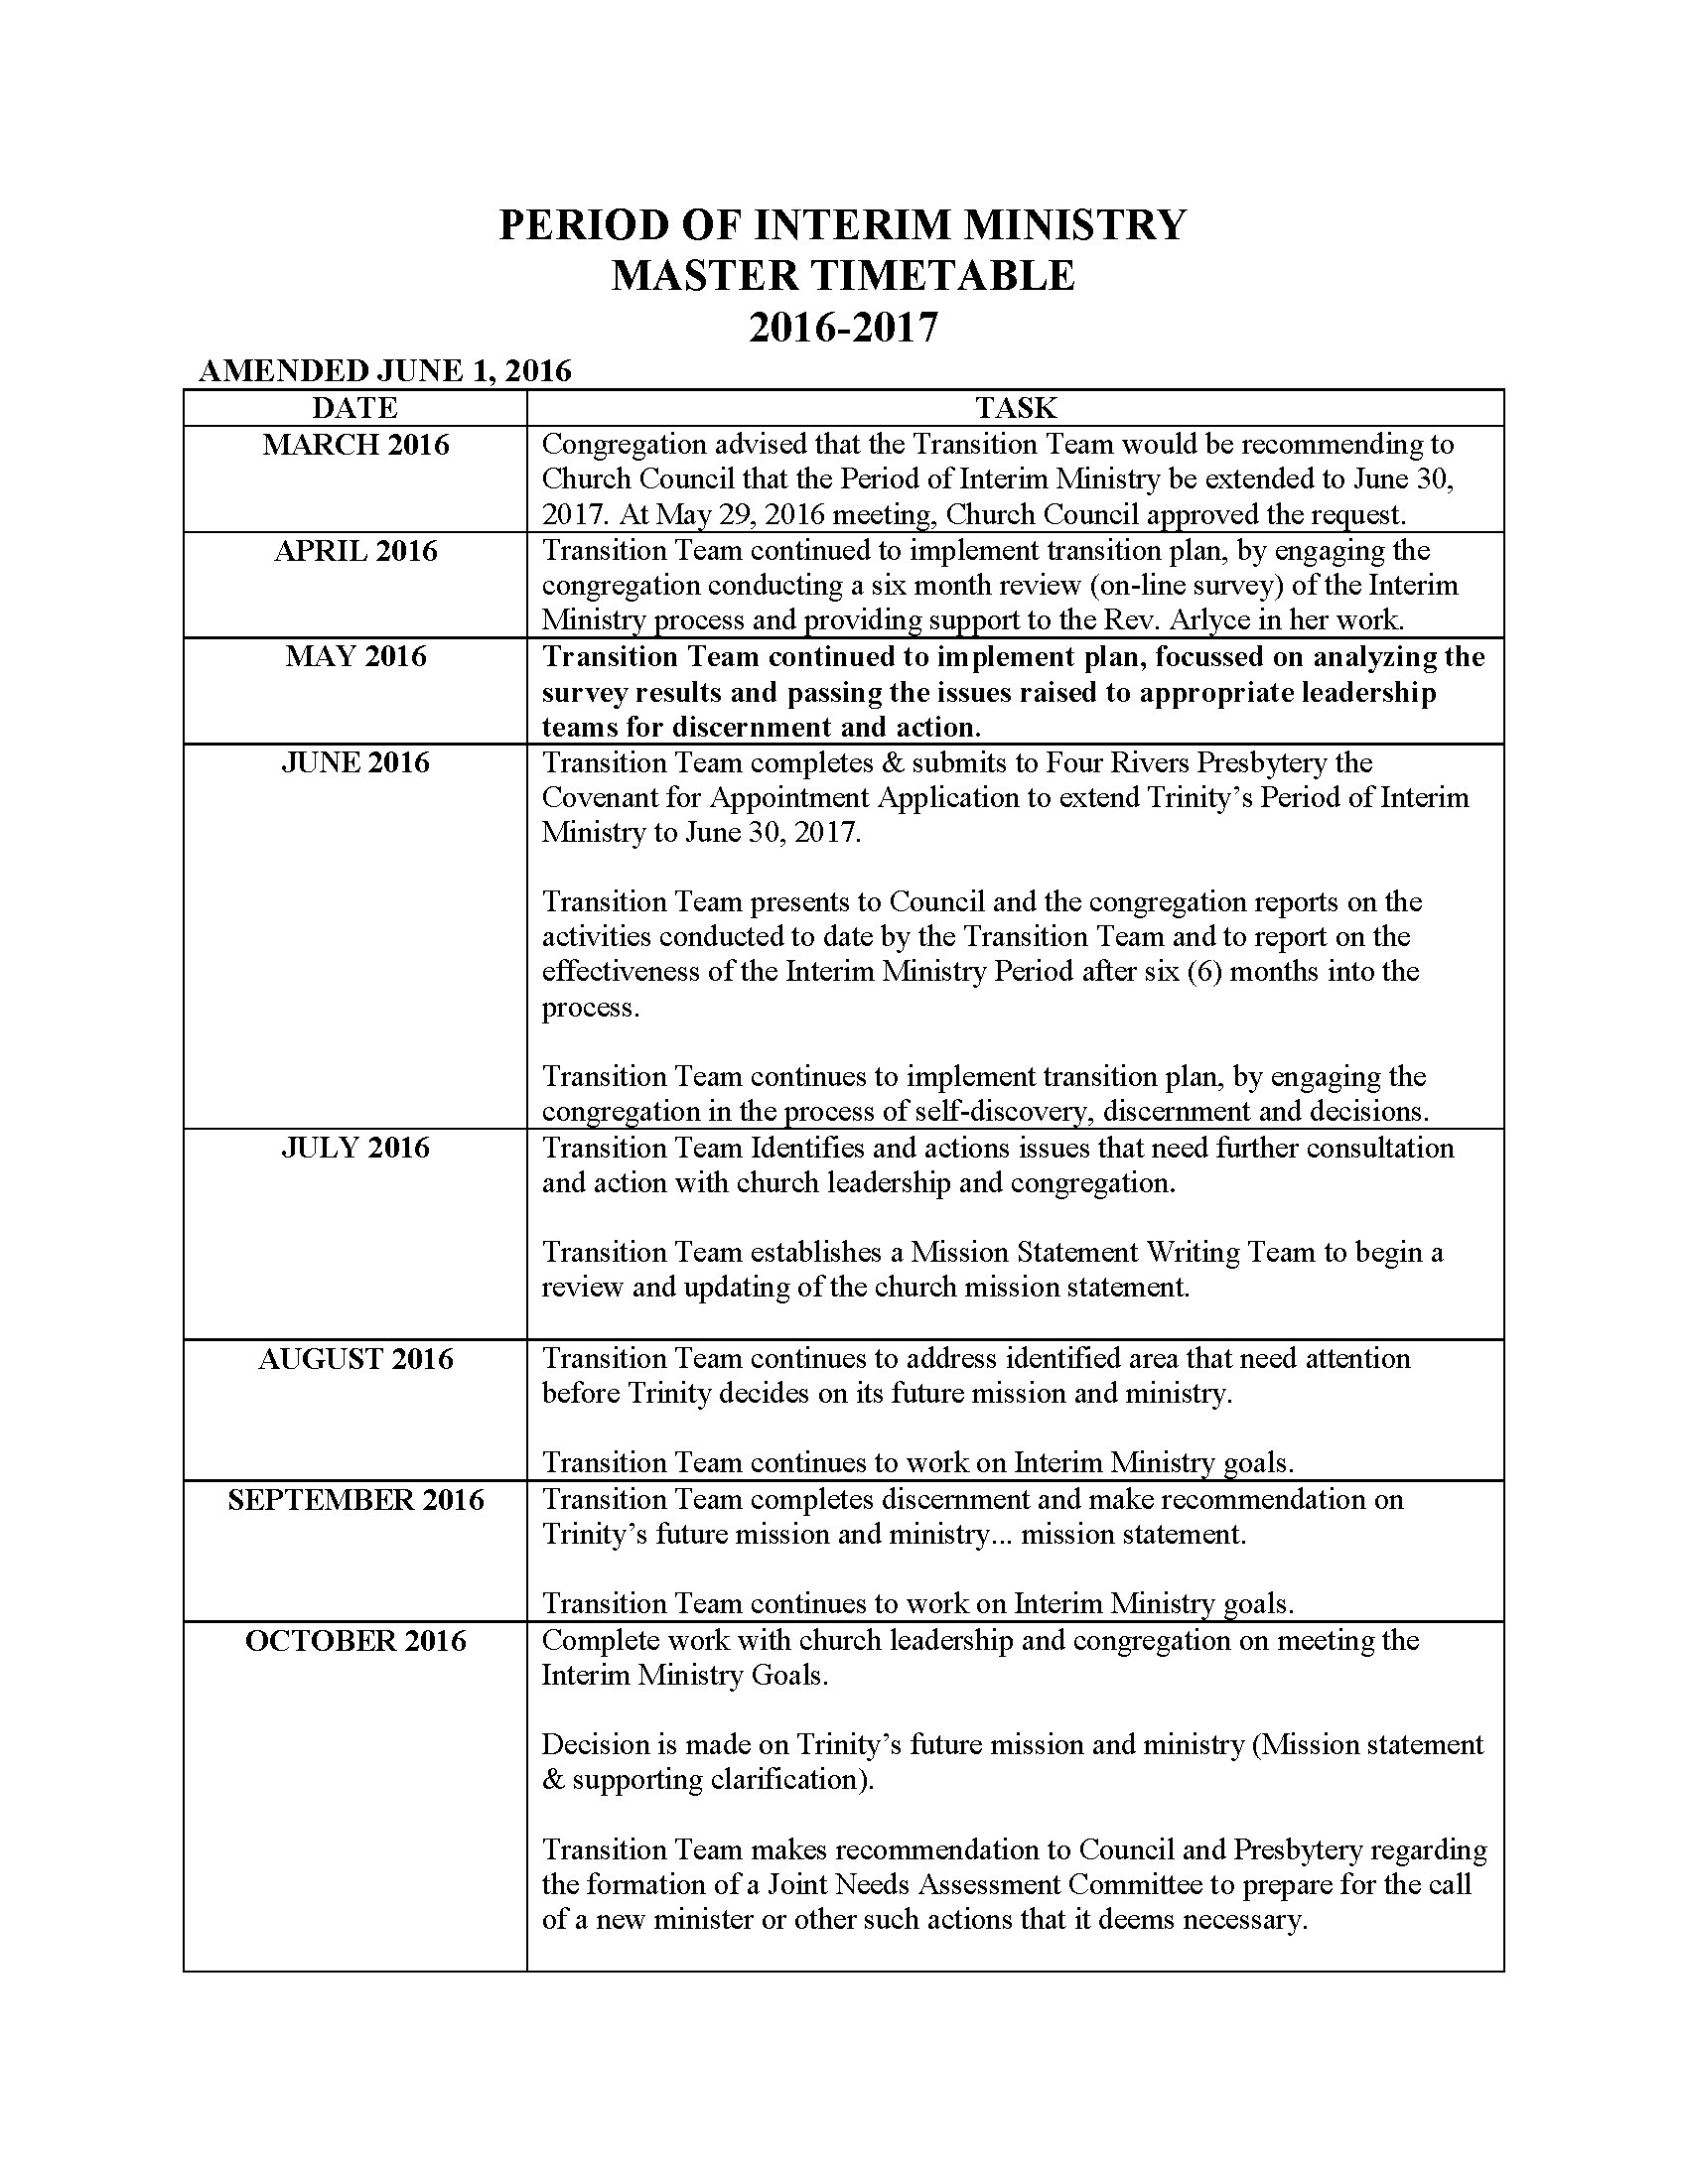 Master Timetable Trinity United Church